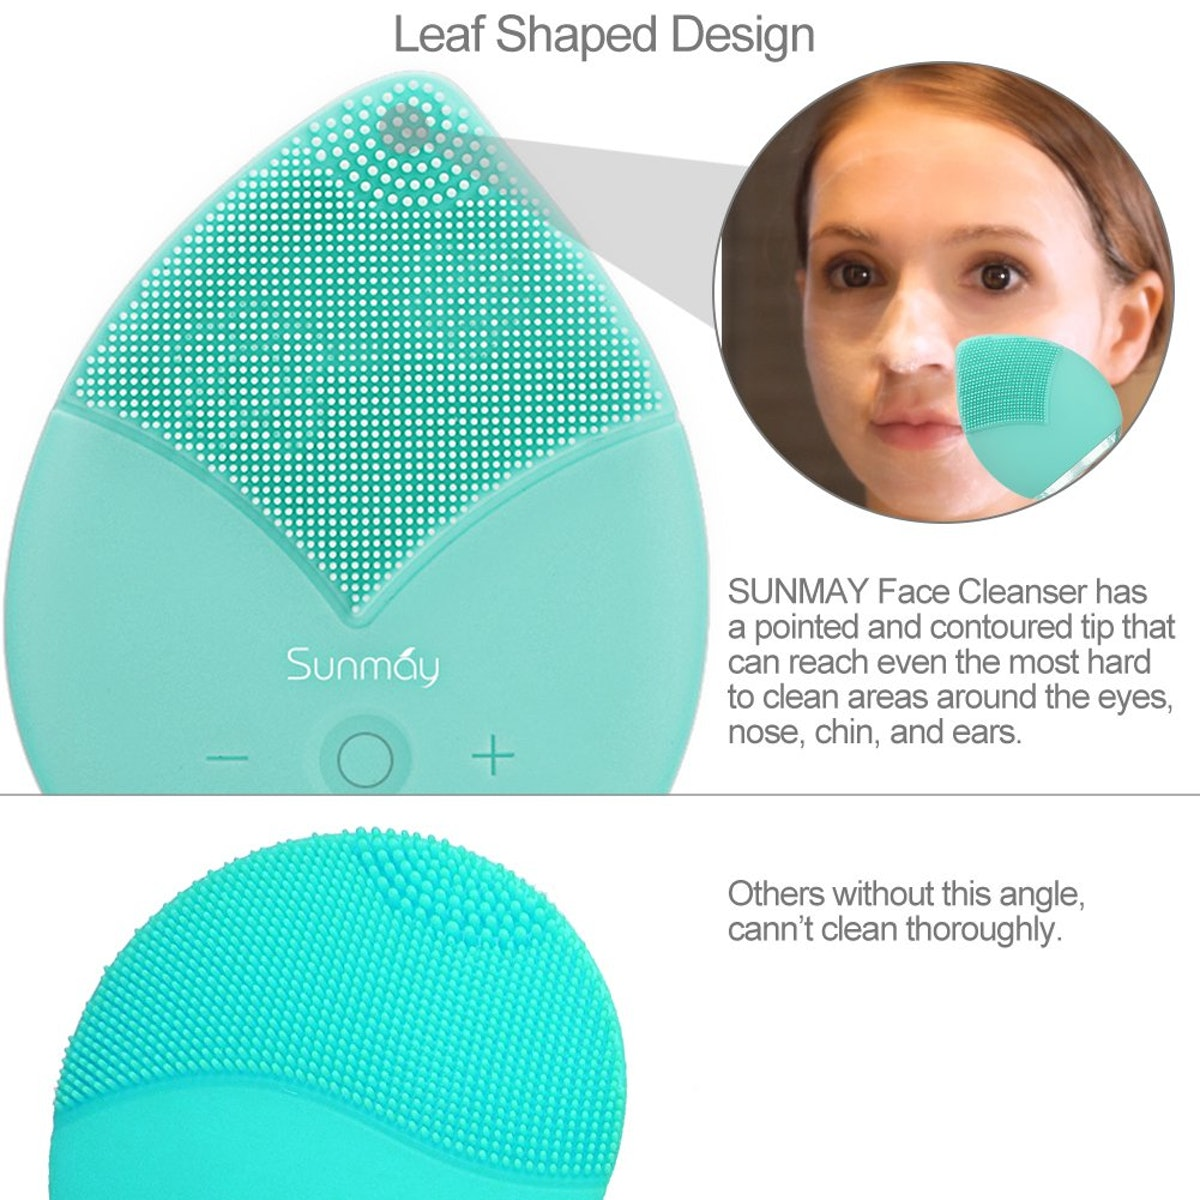 SUNMAY Sonic Facial Cleansing Brush